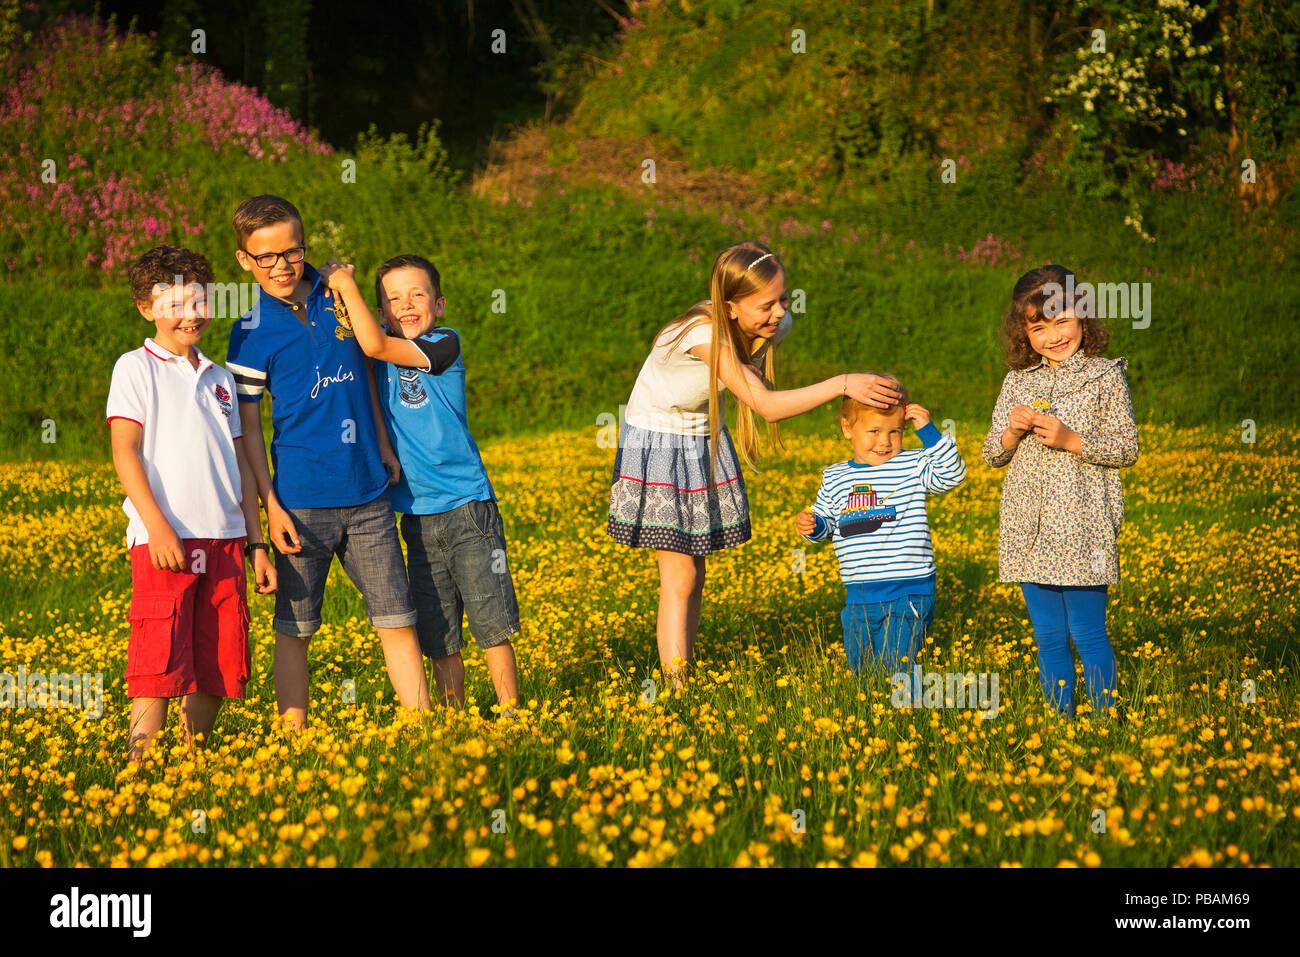 A group portrait of six children in a field of flowers,Devon UK - Stock Image